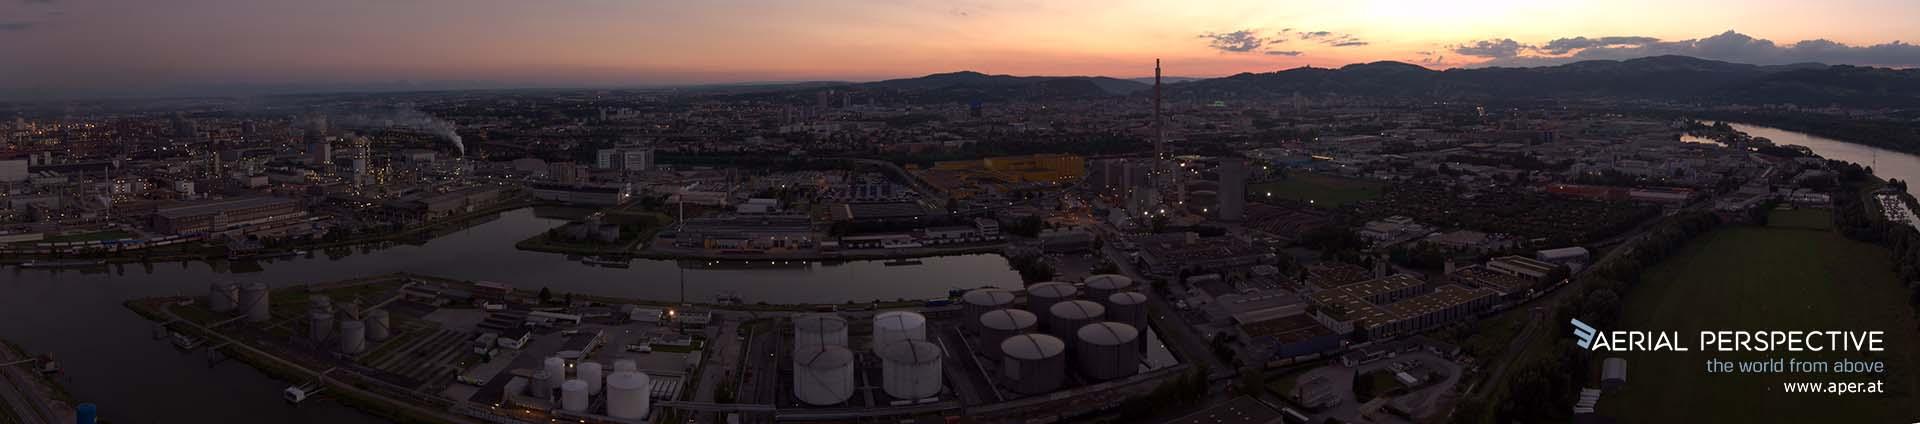 Tankhafen Linz Panorama